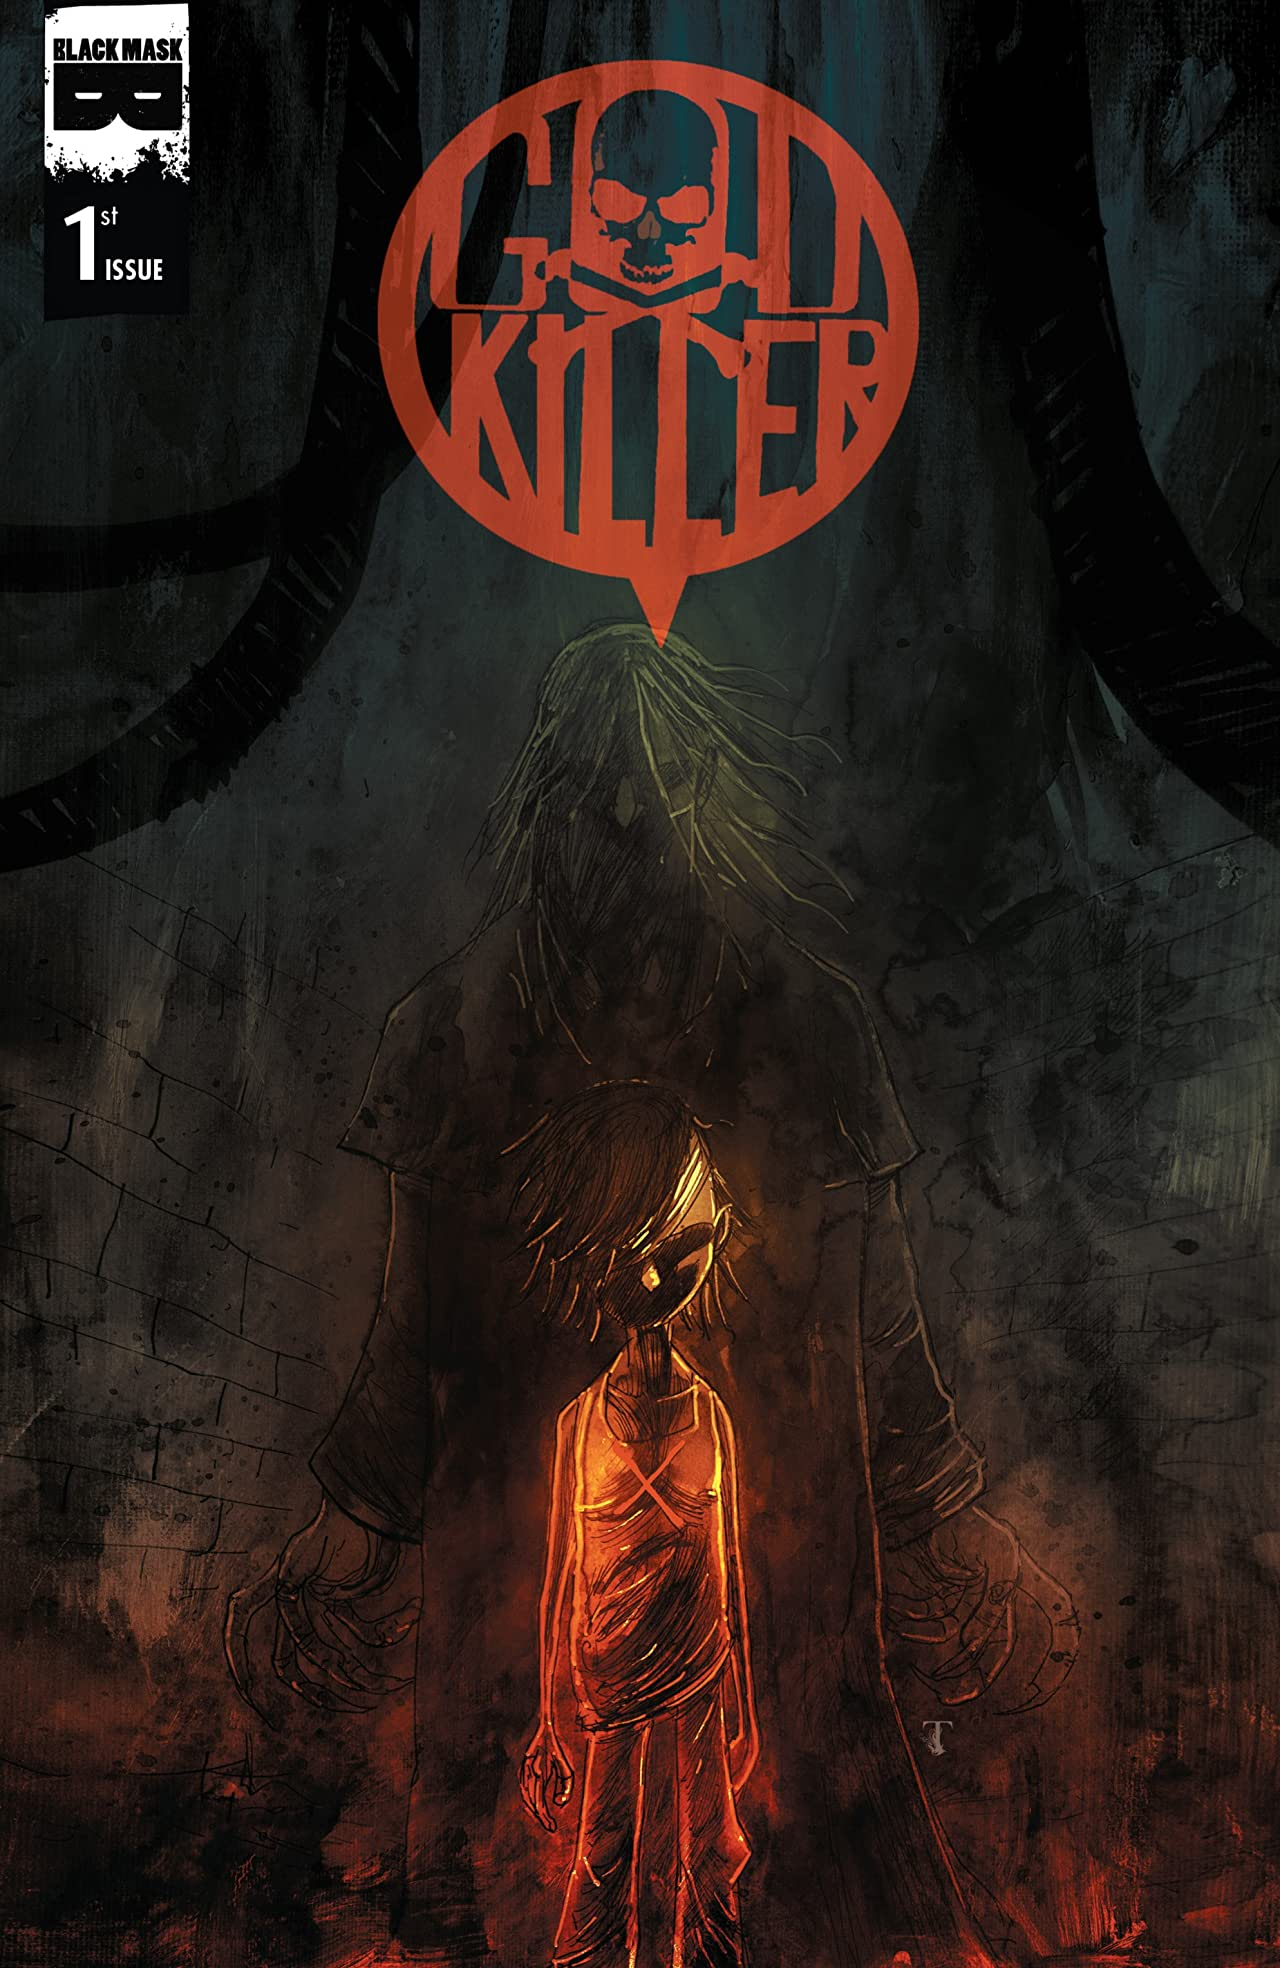 Godkiller: Walk Among Us #1